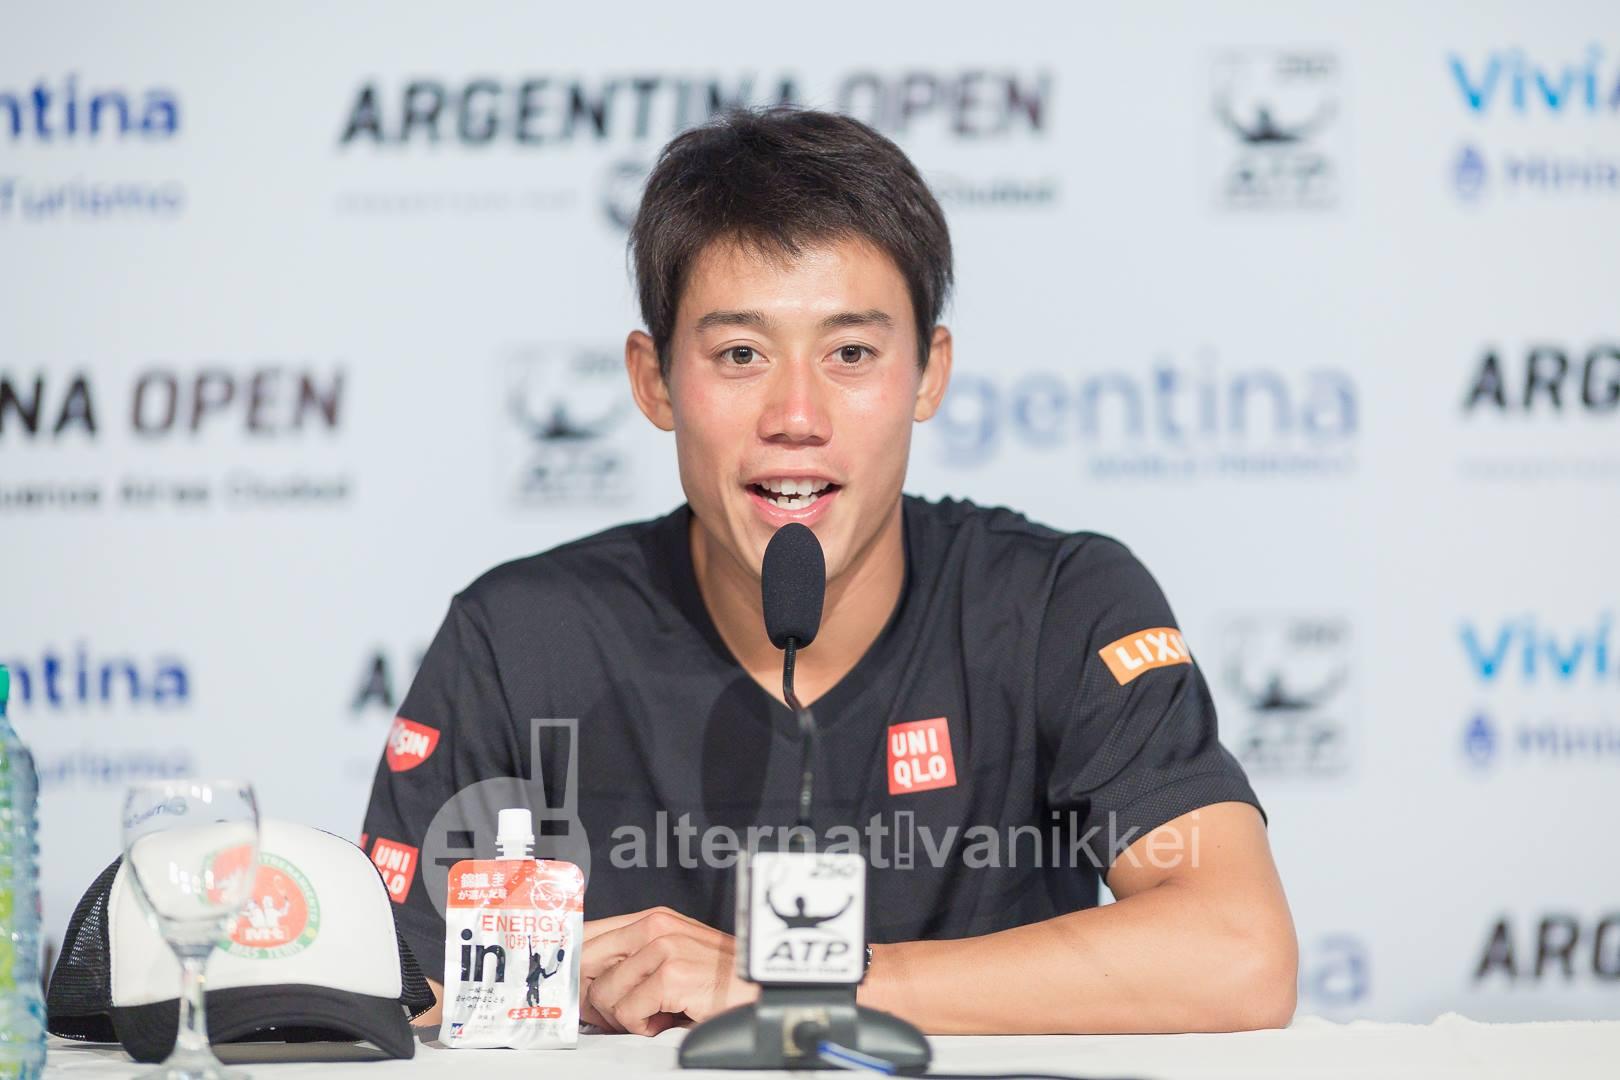 Nishikori responde a las preguntas de la prensa / Foto: Jason Kung Web de Jason Kung: http://jasonkphoto.com/web/ FB Page: https://www.facebook.com/jasonkphotostudio/